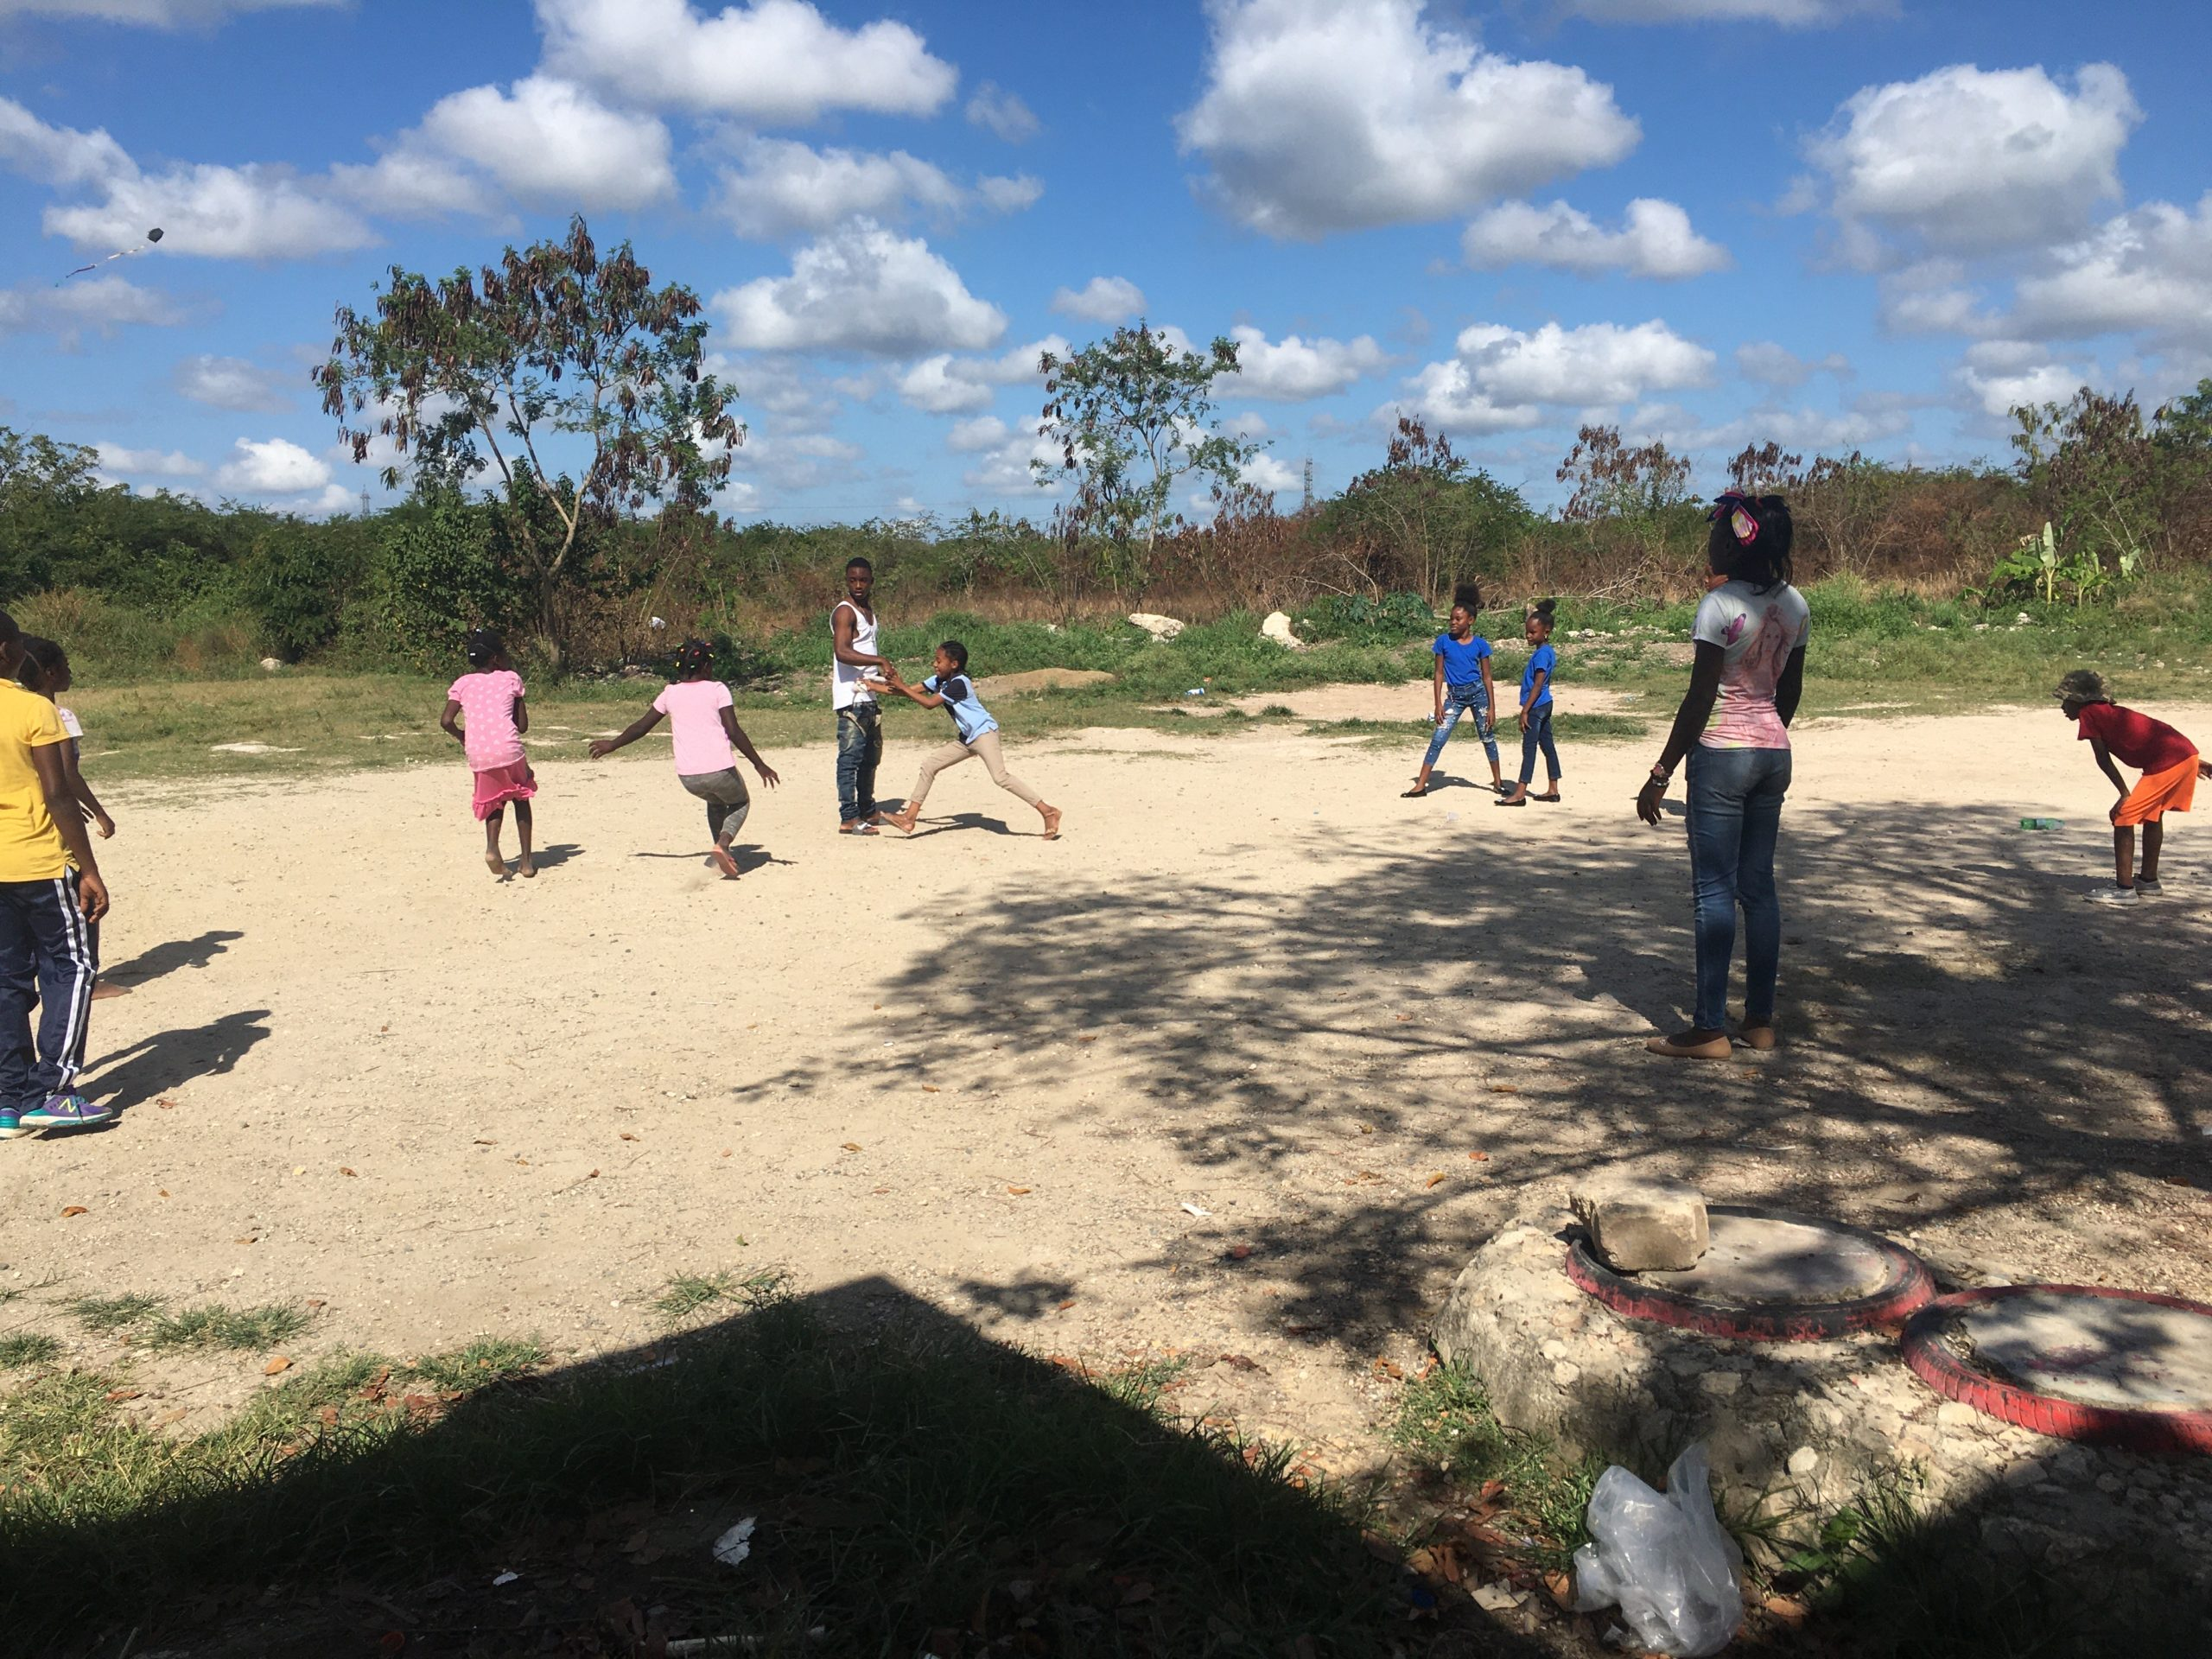 Dominican_Republic_Kaitlin_Thompson_IMG_2604.jpg